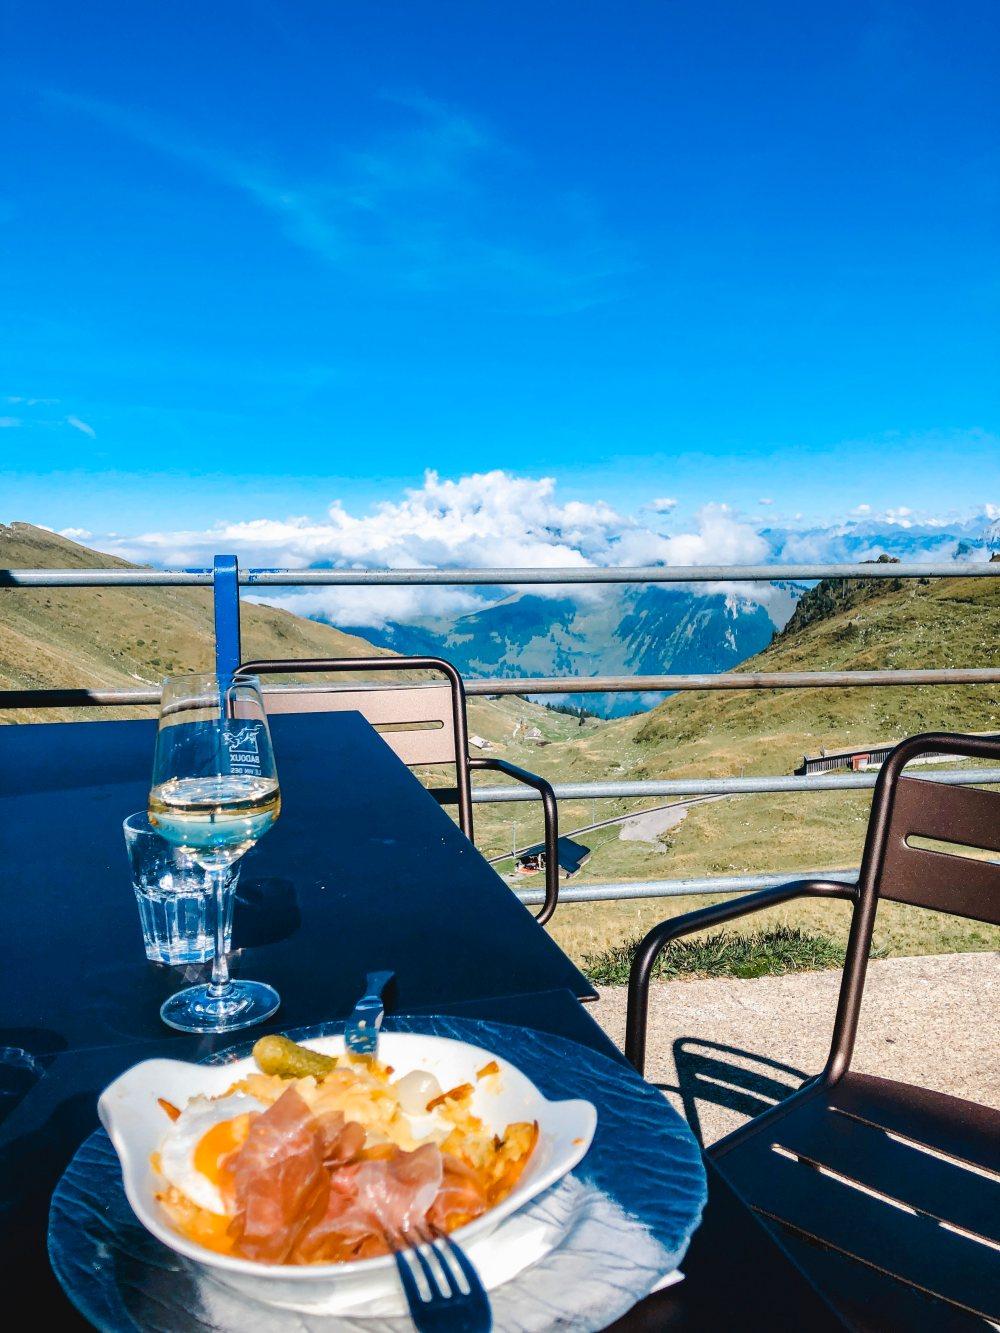 lunch-above-the-skye-rochers-de-naye